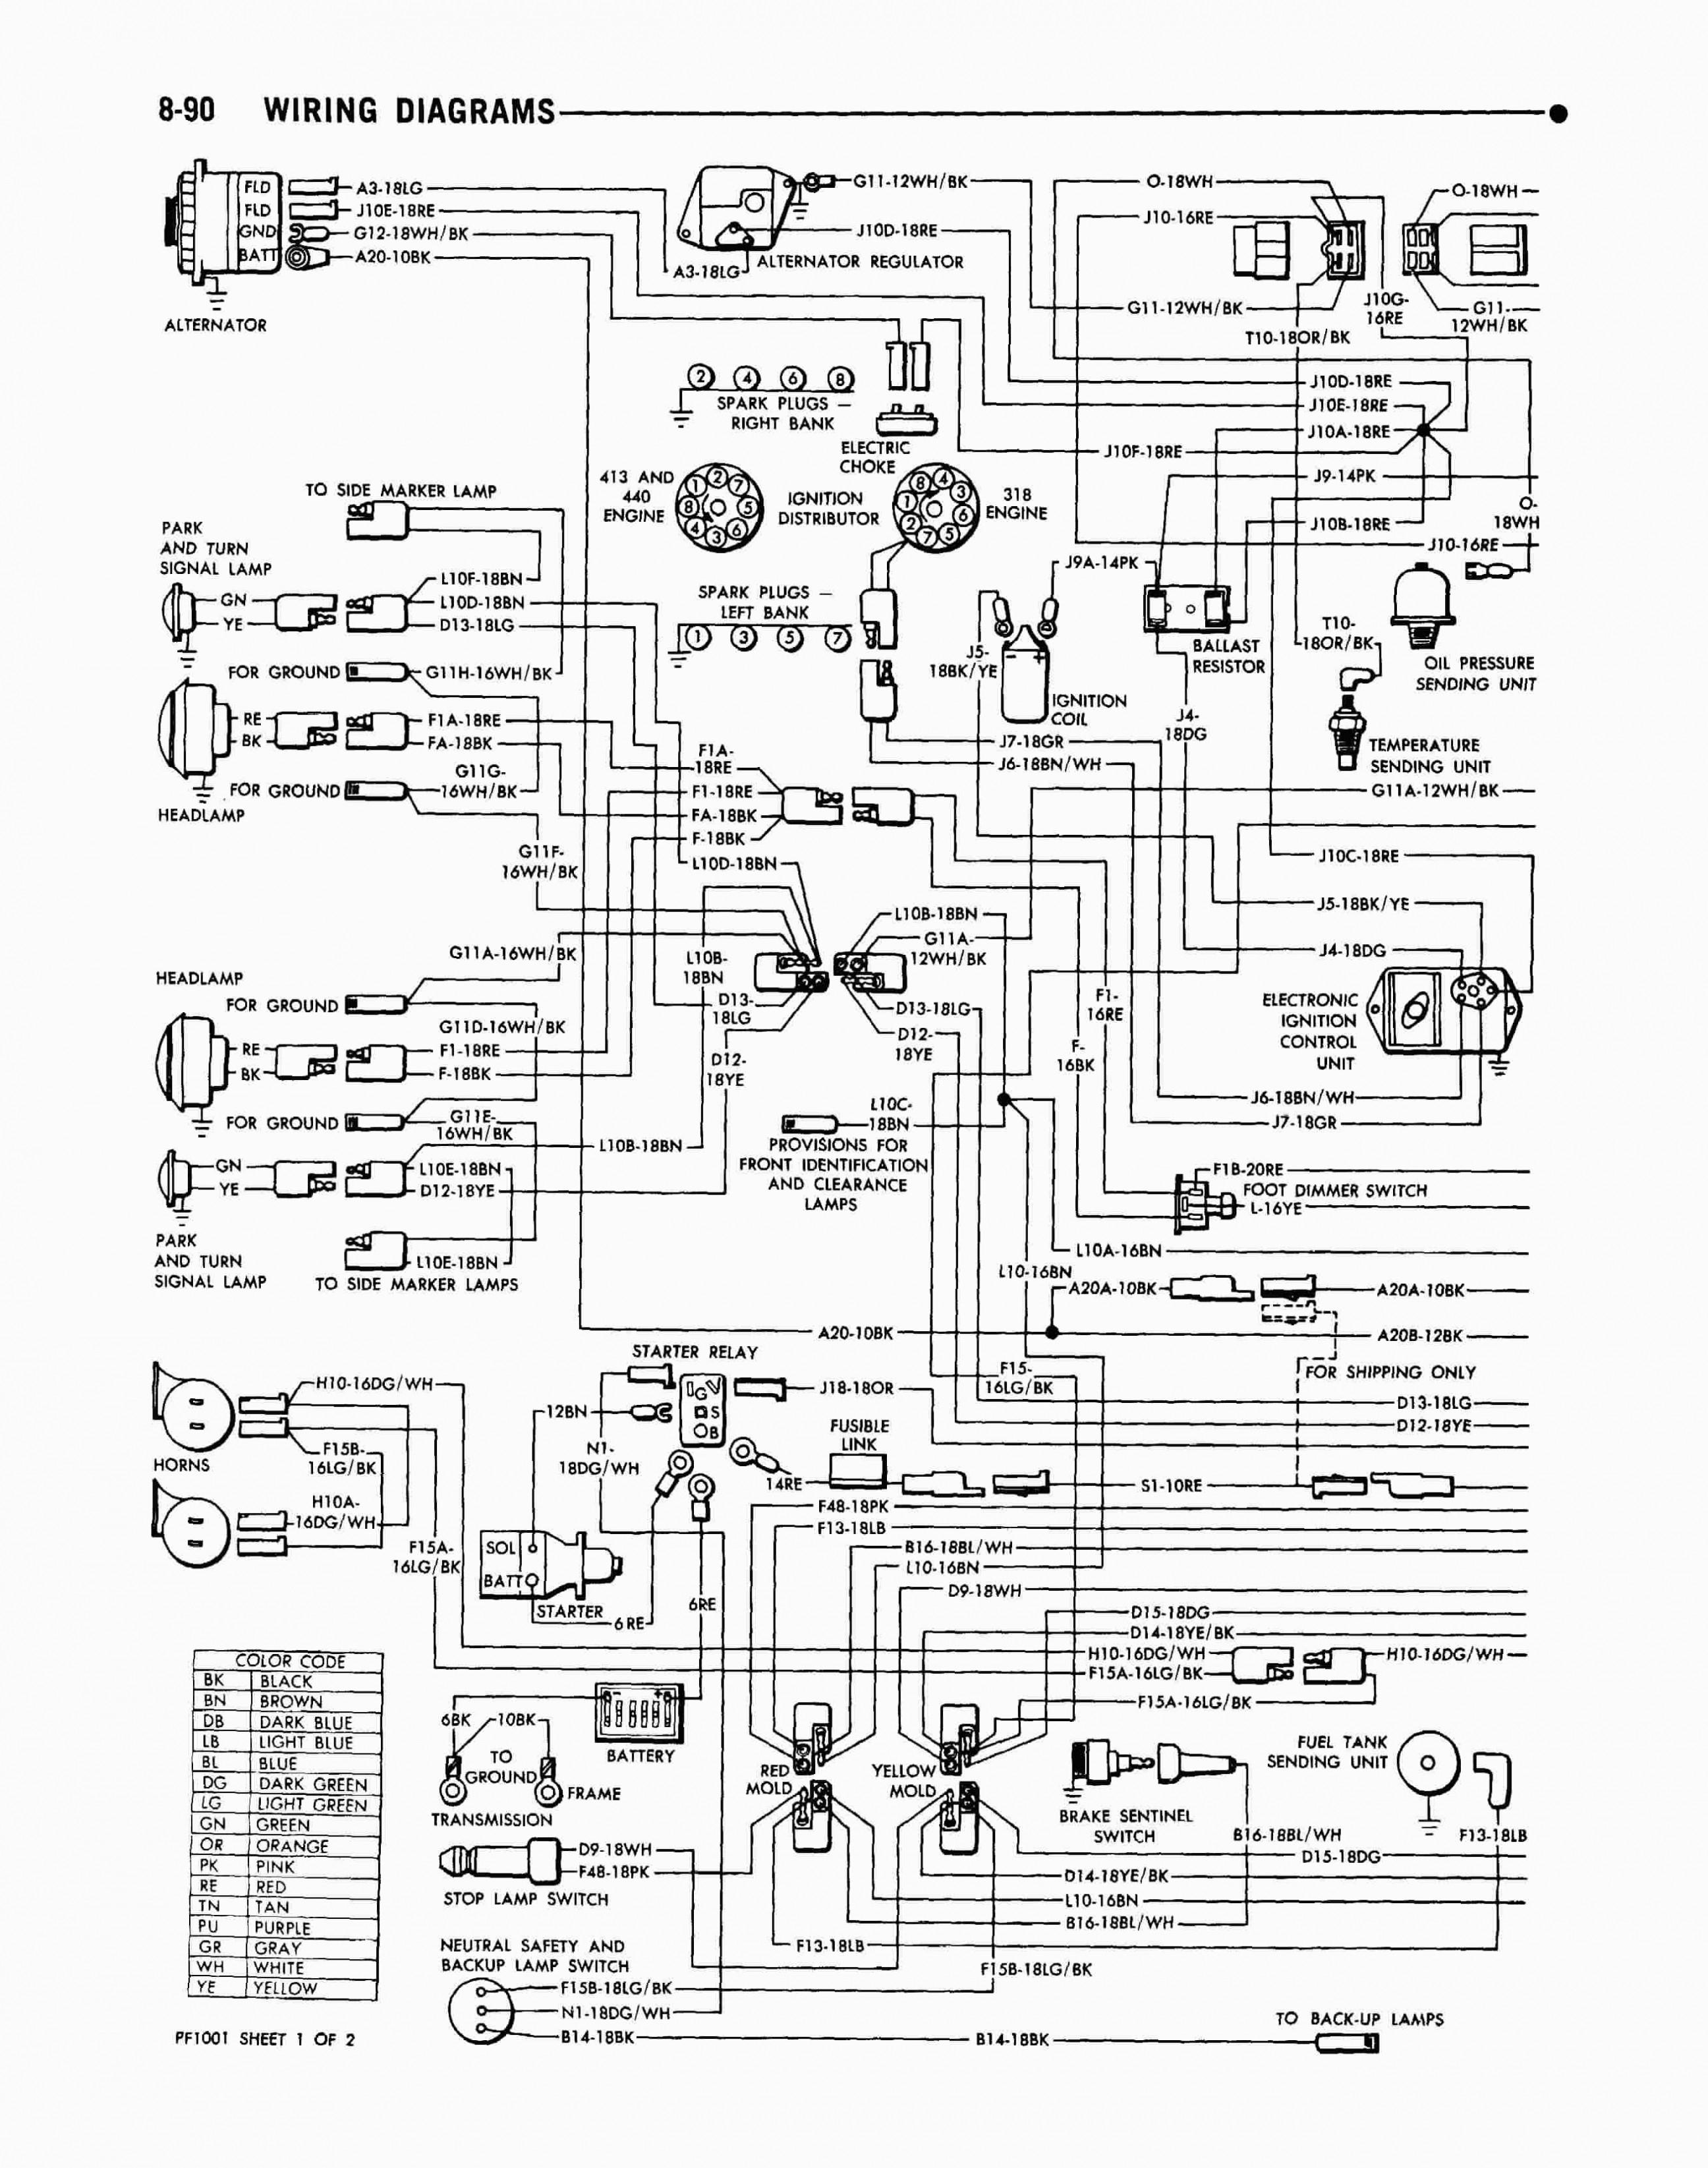 Rv Power Converter Wiring Diagram - Mikulskilawoffices - Rv Power Converter Wiring Diagram